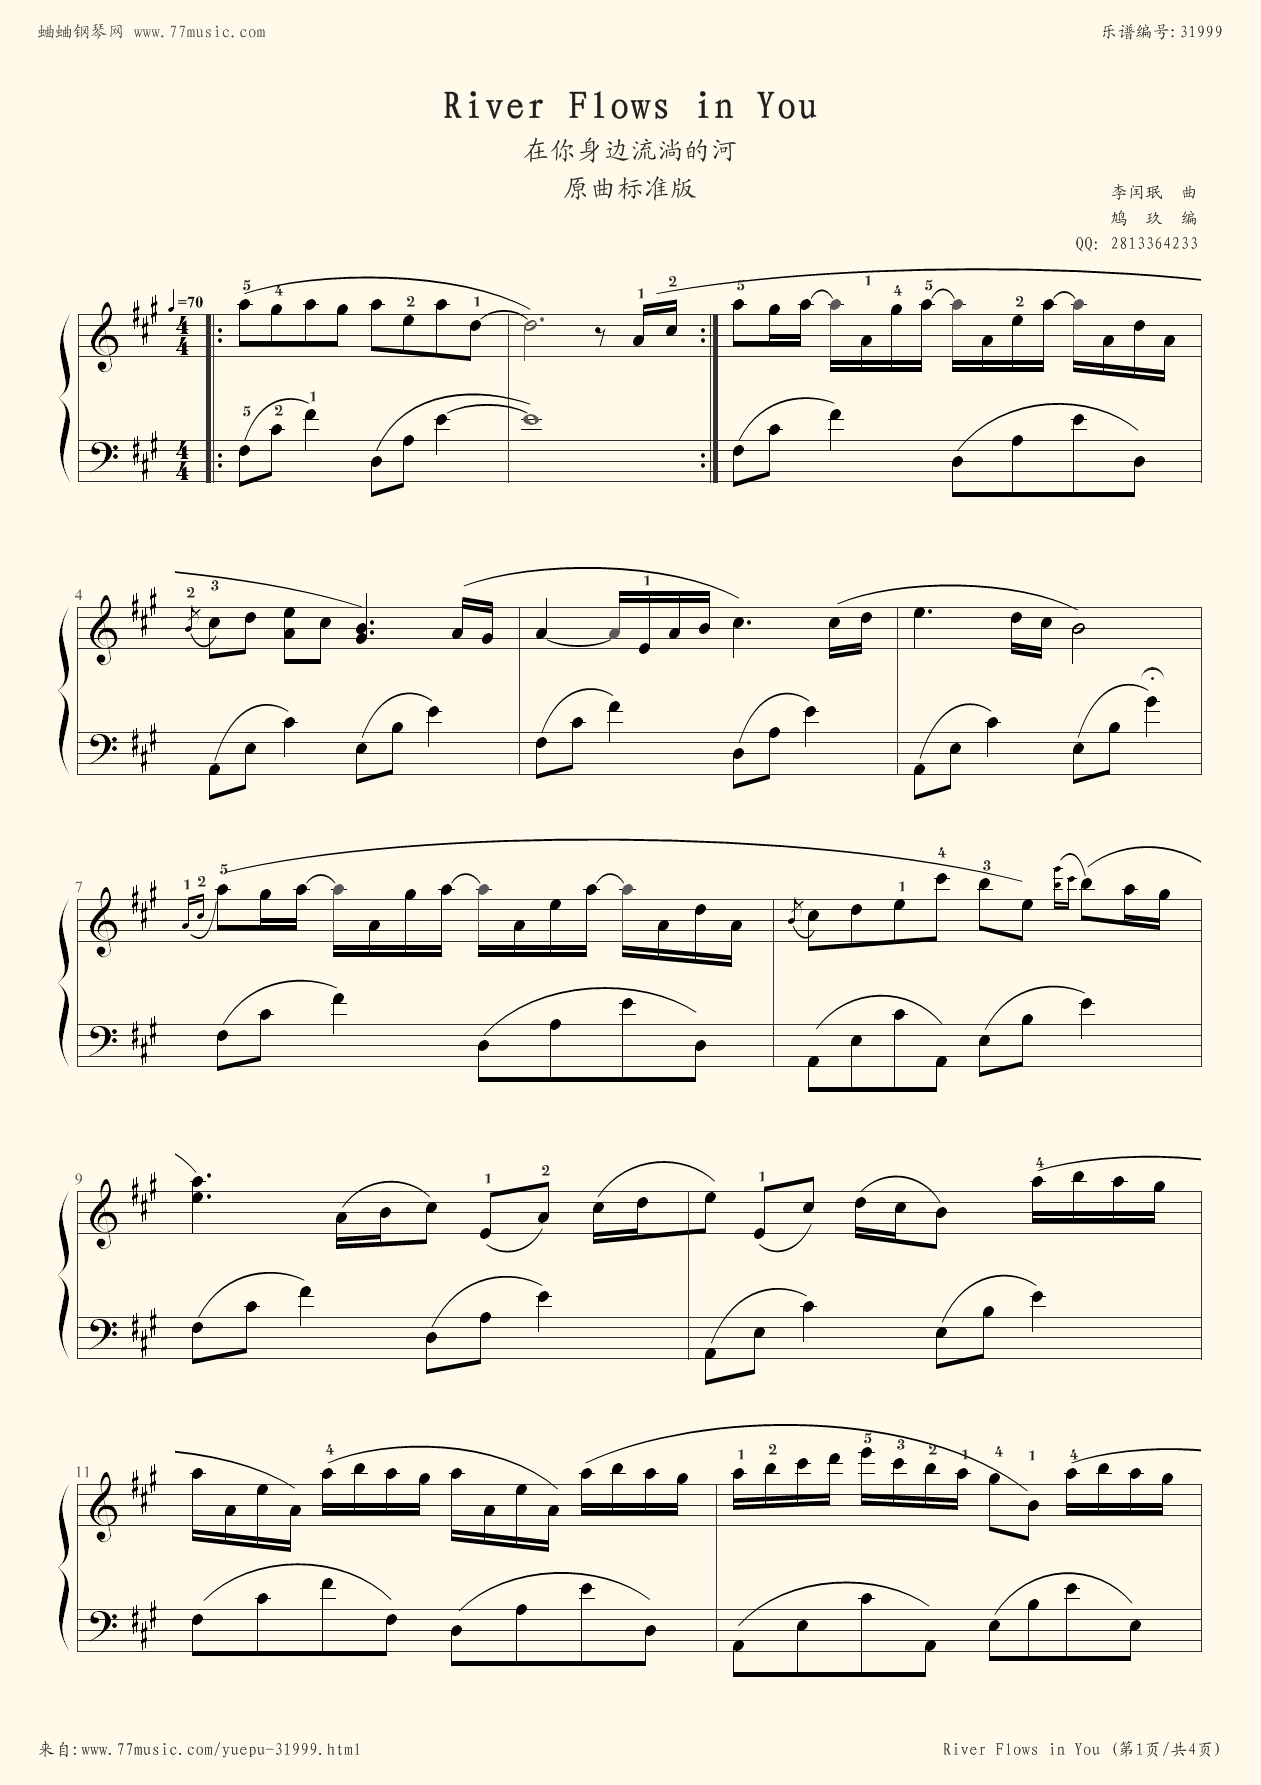 Who is Yiruma Did he write music for Twilight